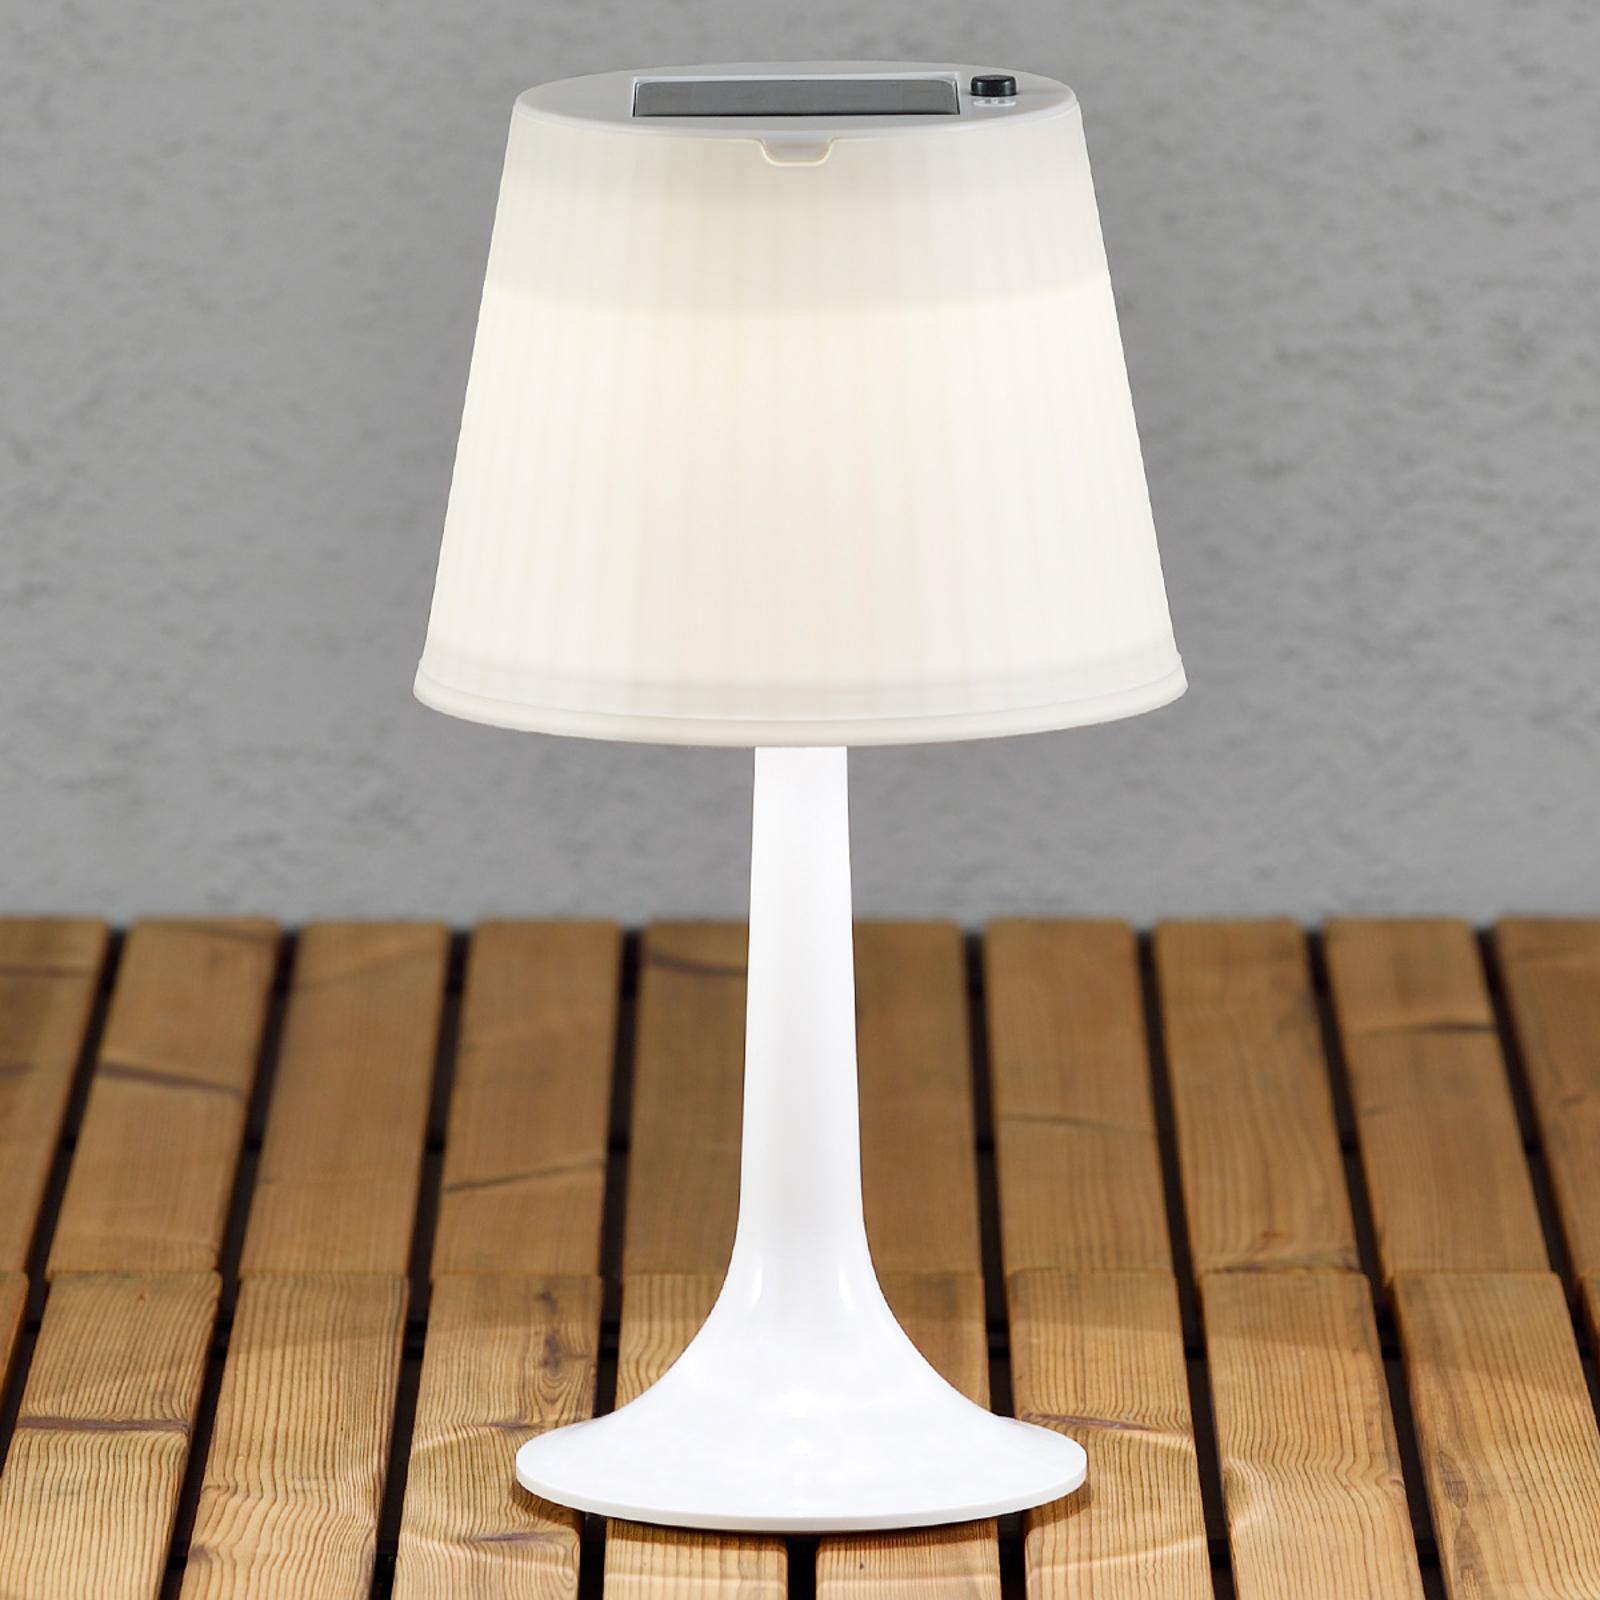 Biała solarna lampa stołowa LED ASSISI SITRA